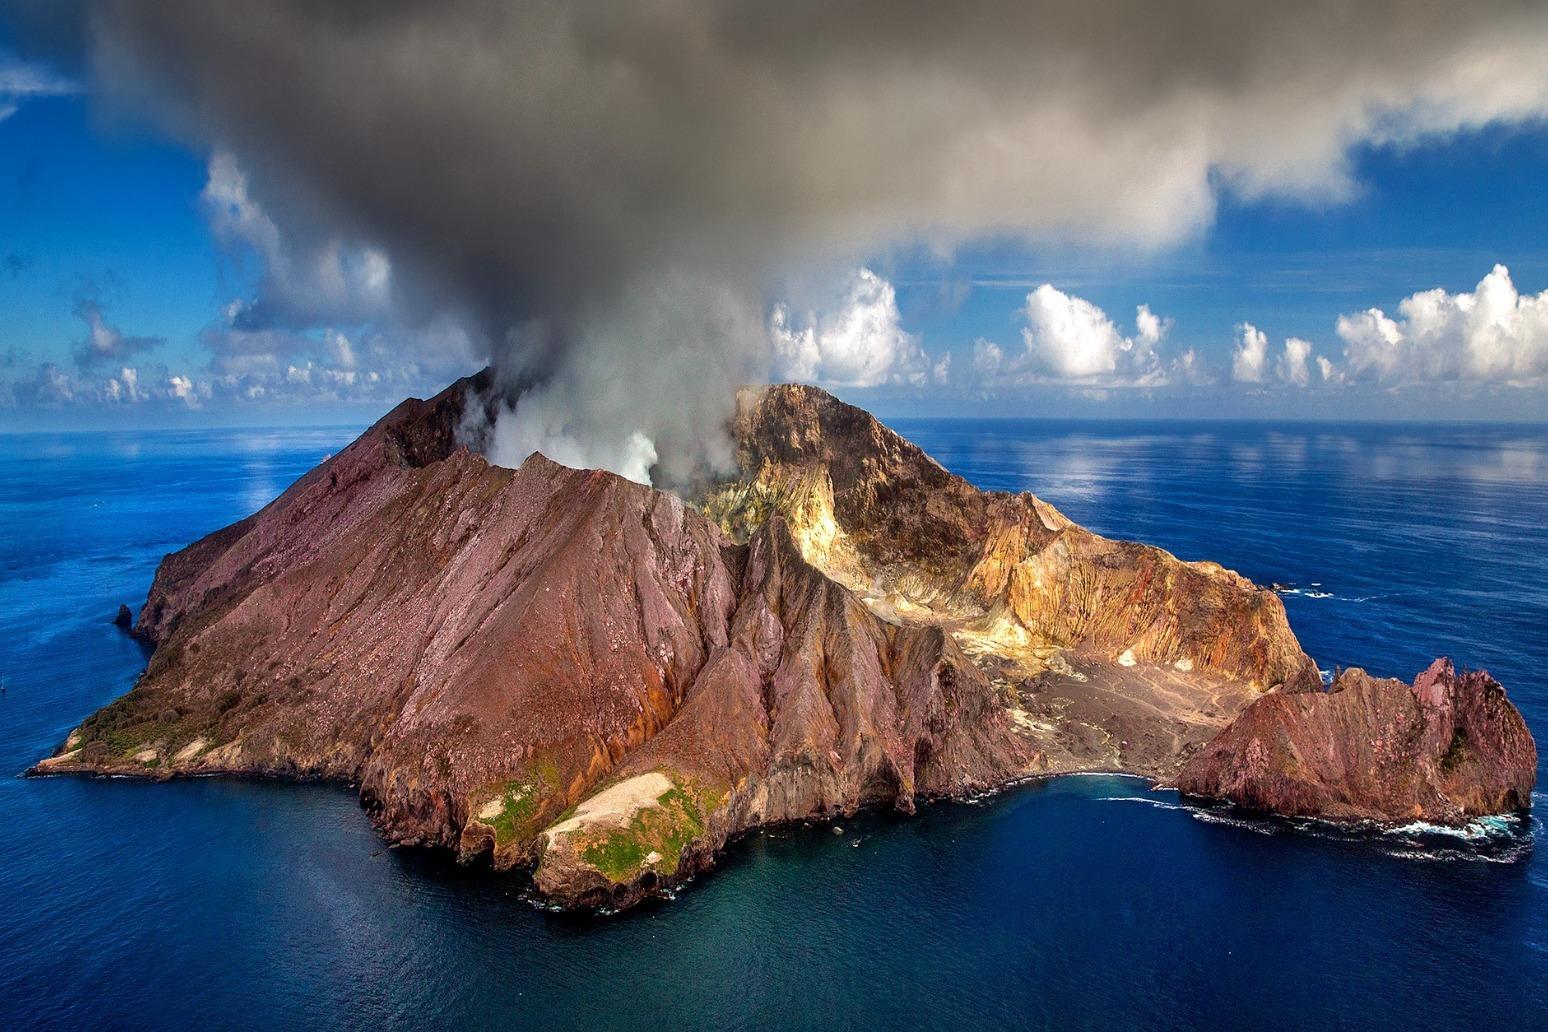 Landslide on Krakatau volcano seen as likely trigger of Indonesia tsunami